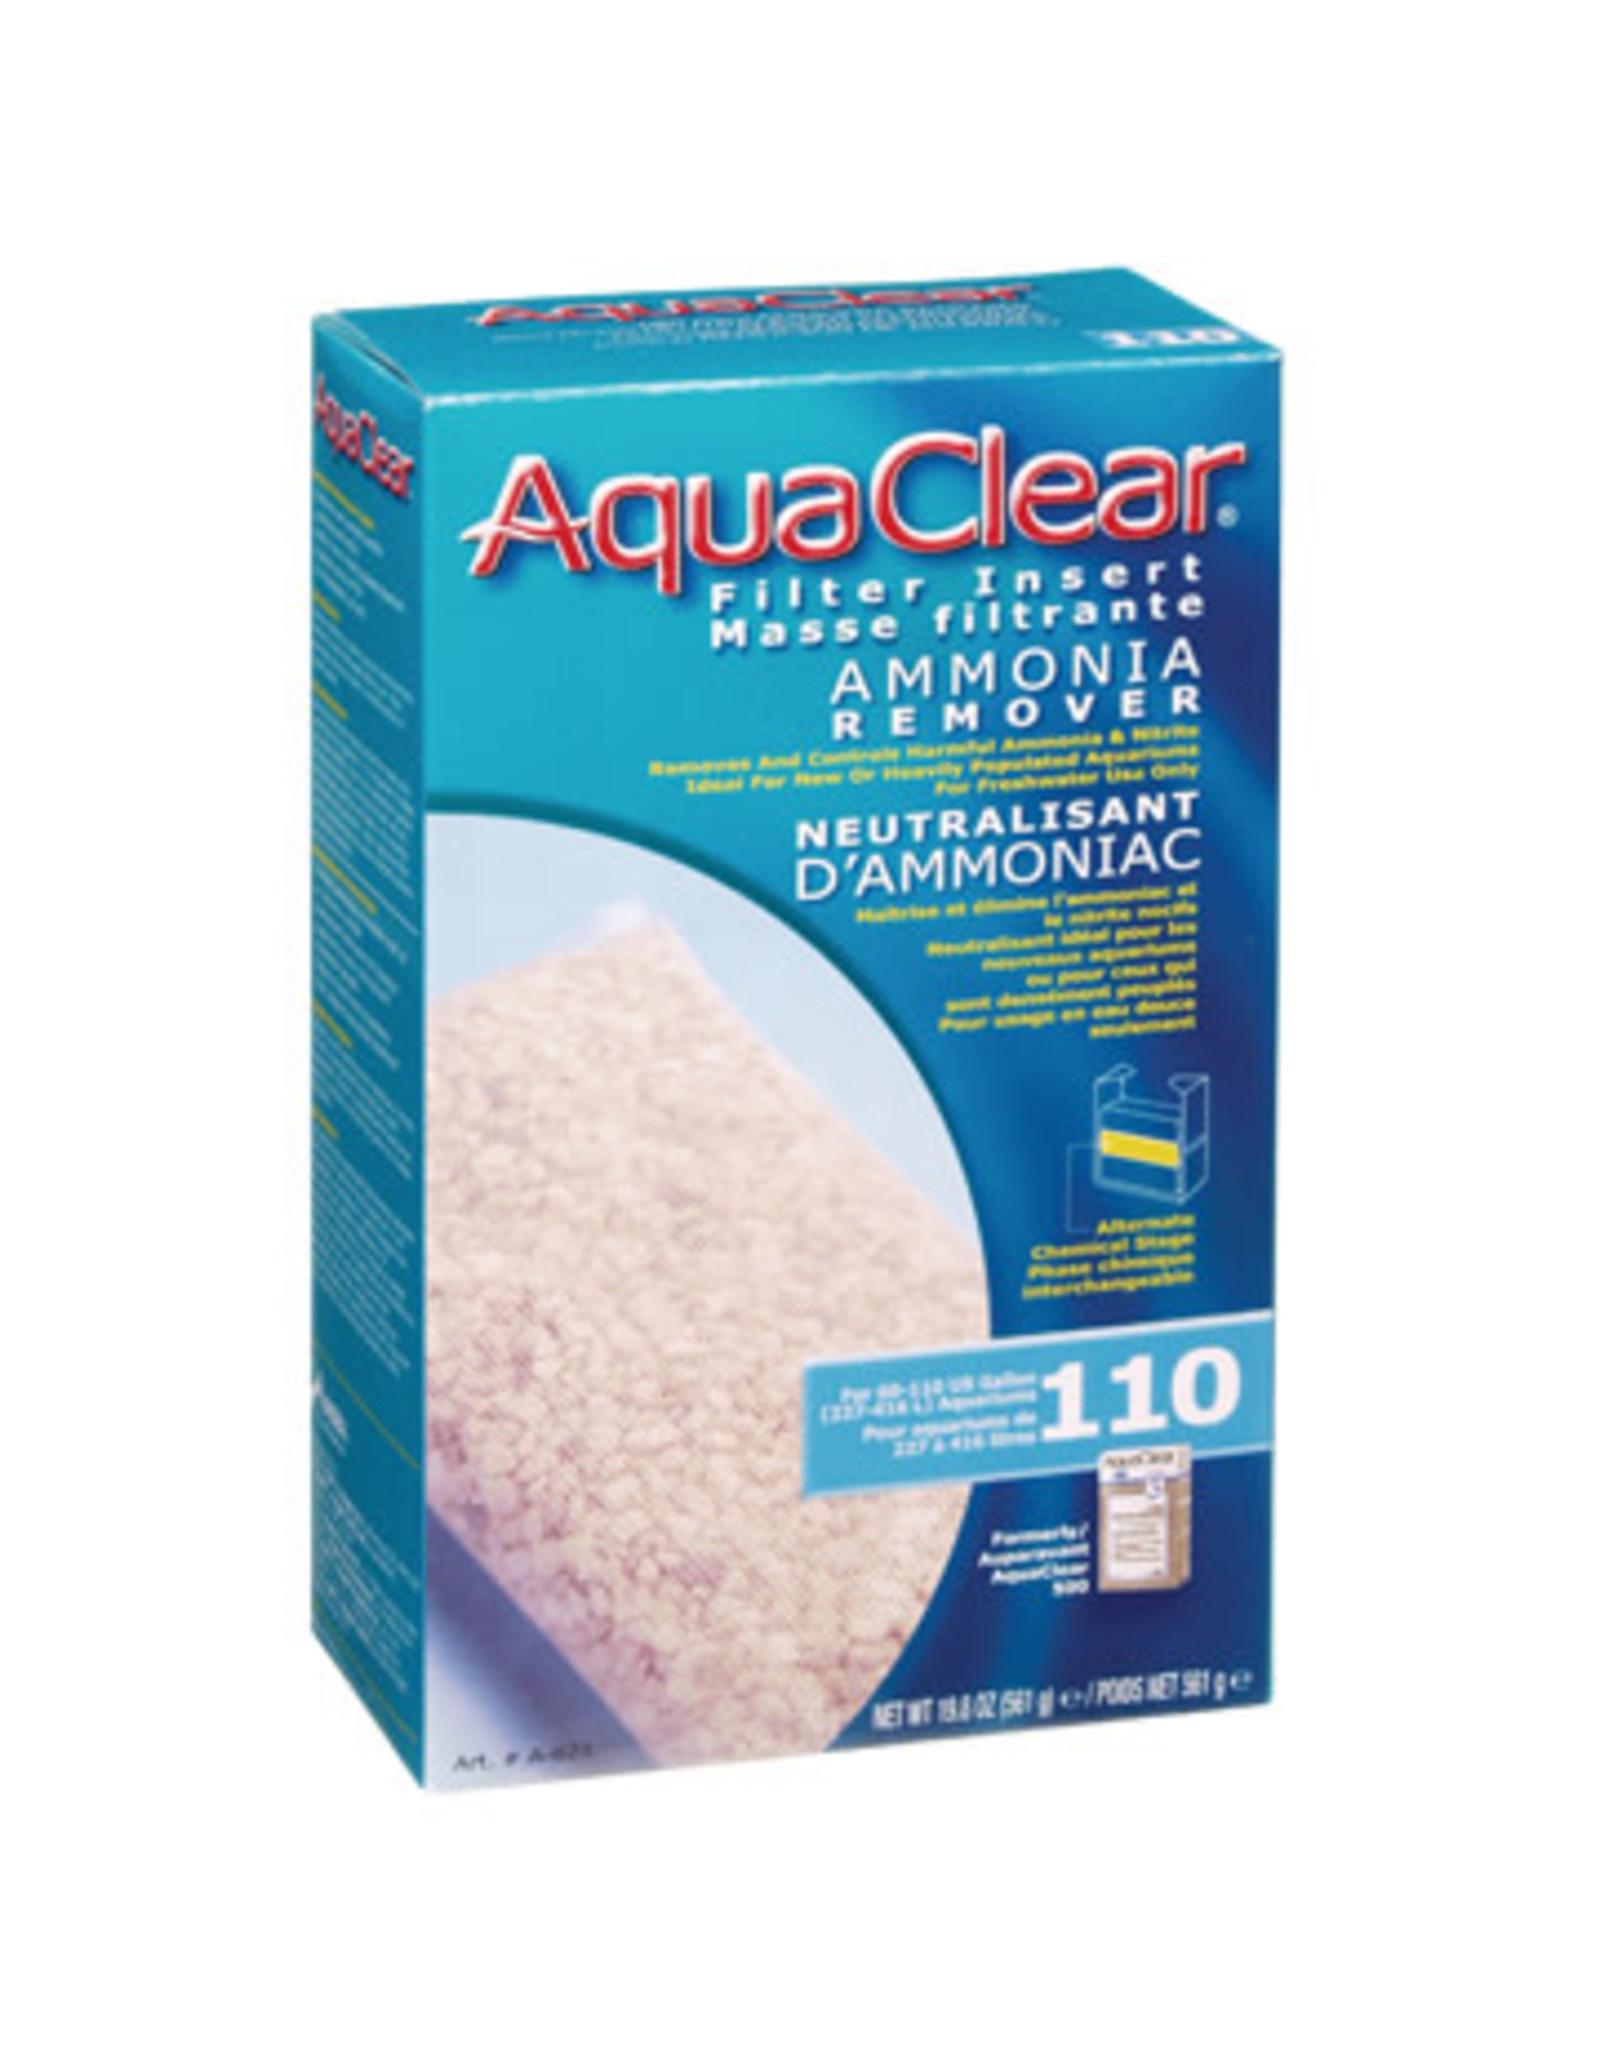 AquaClear AquaClear 110 Ammonia Remover 561g